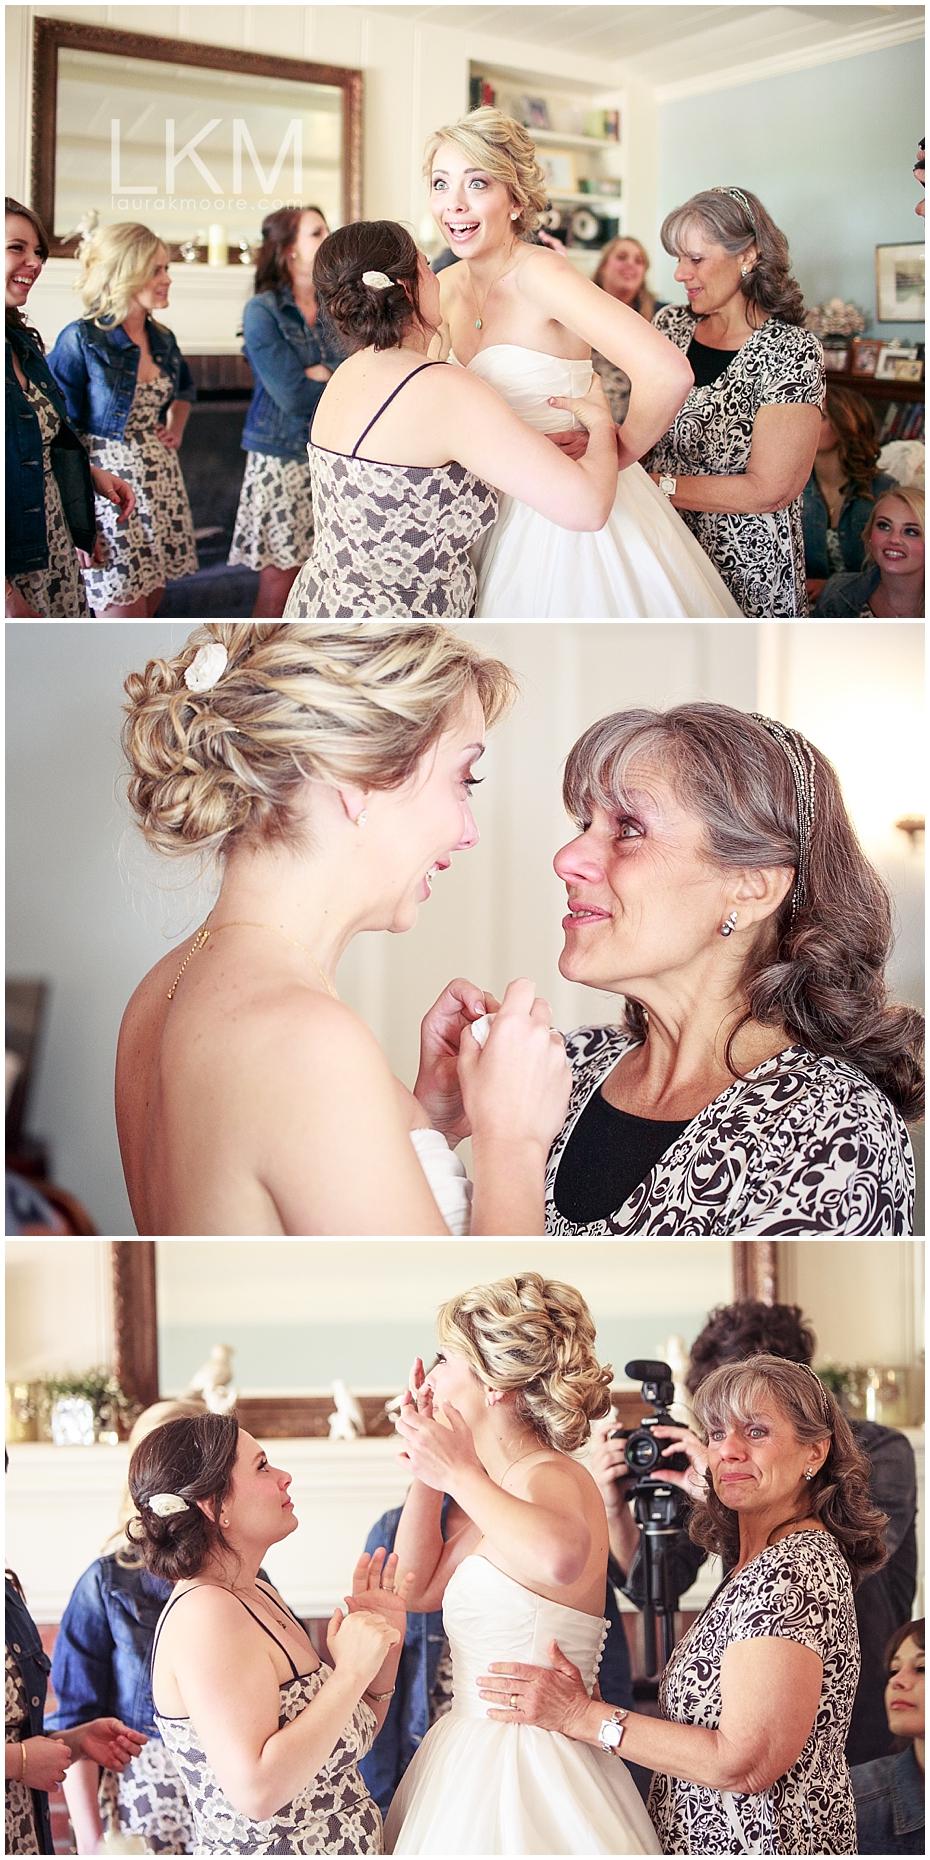 pasadena-wedding-photographer-vintage-burlap-laura-k-moore_0007.jpg